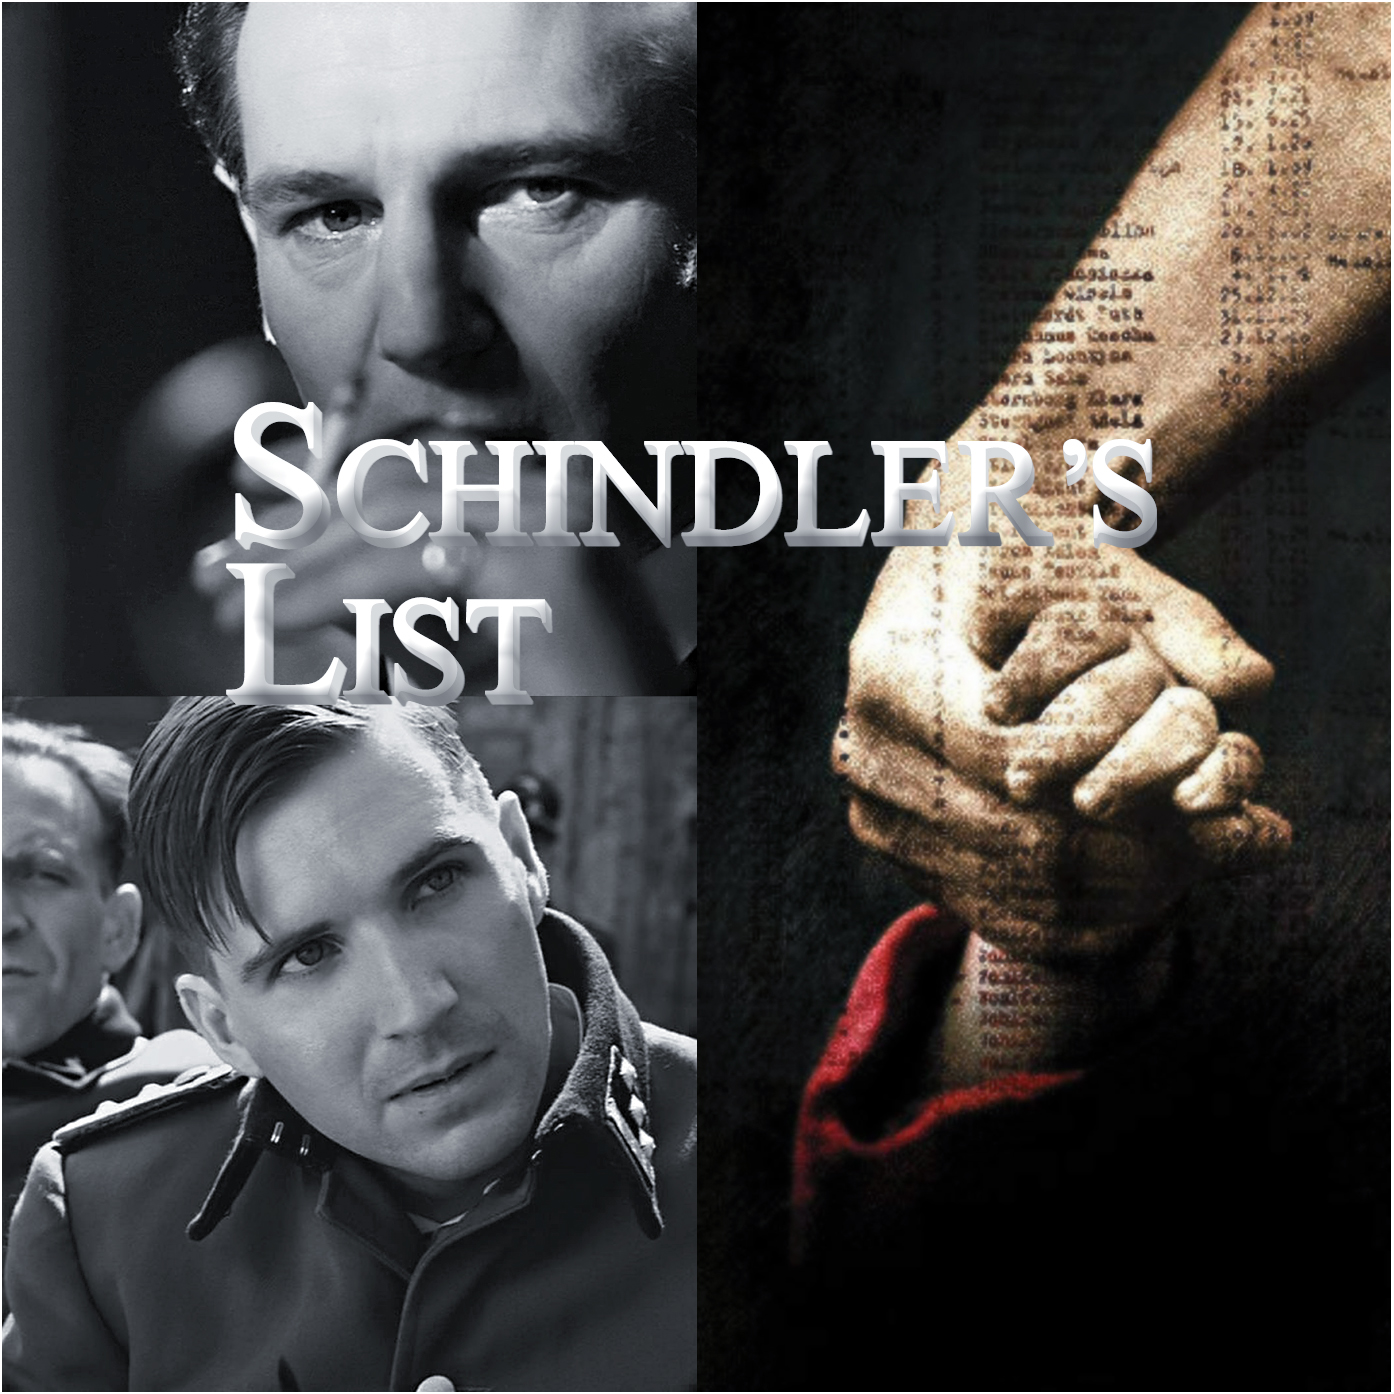 Image result for schindler's list movie